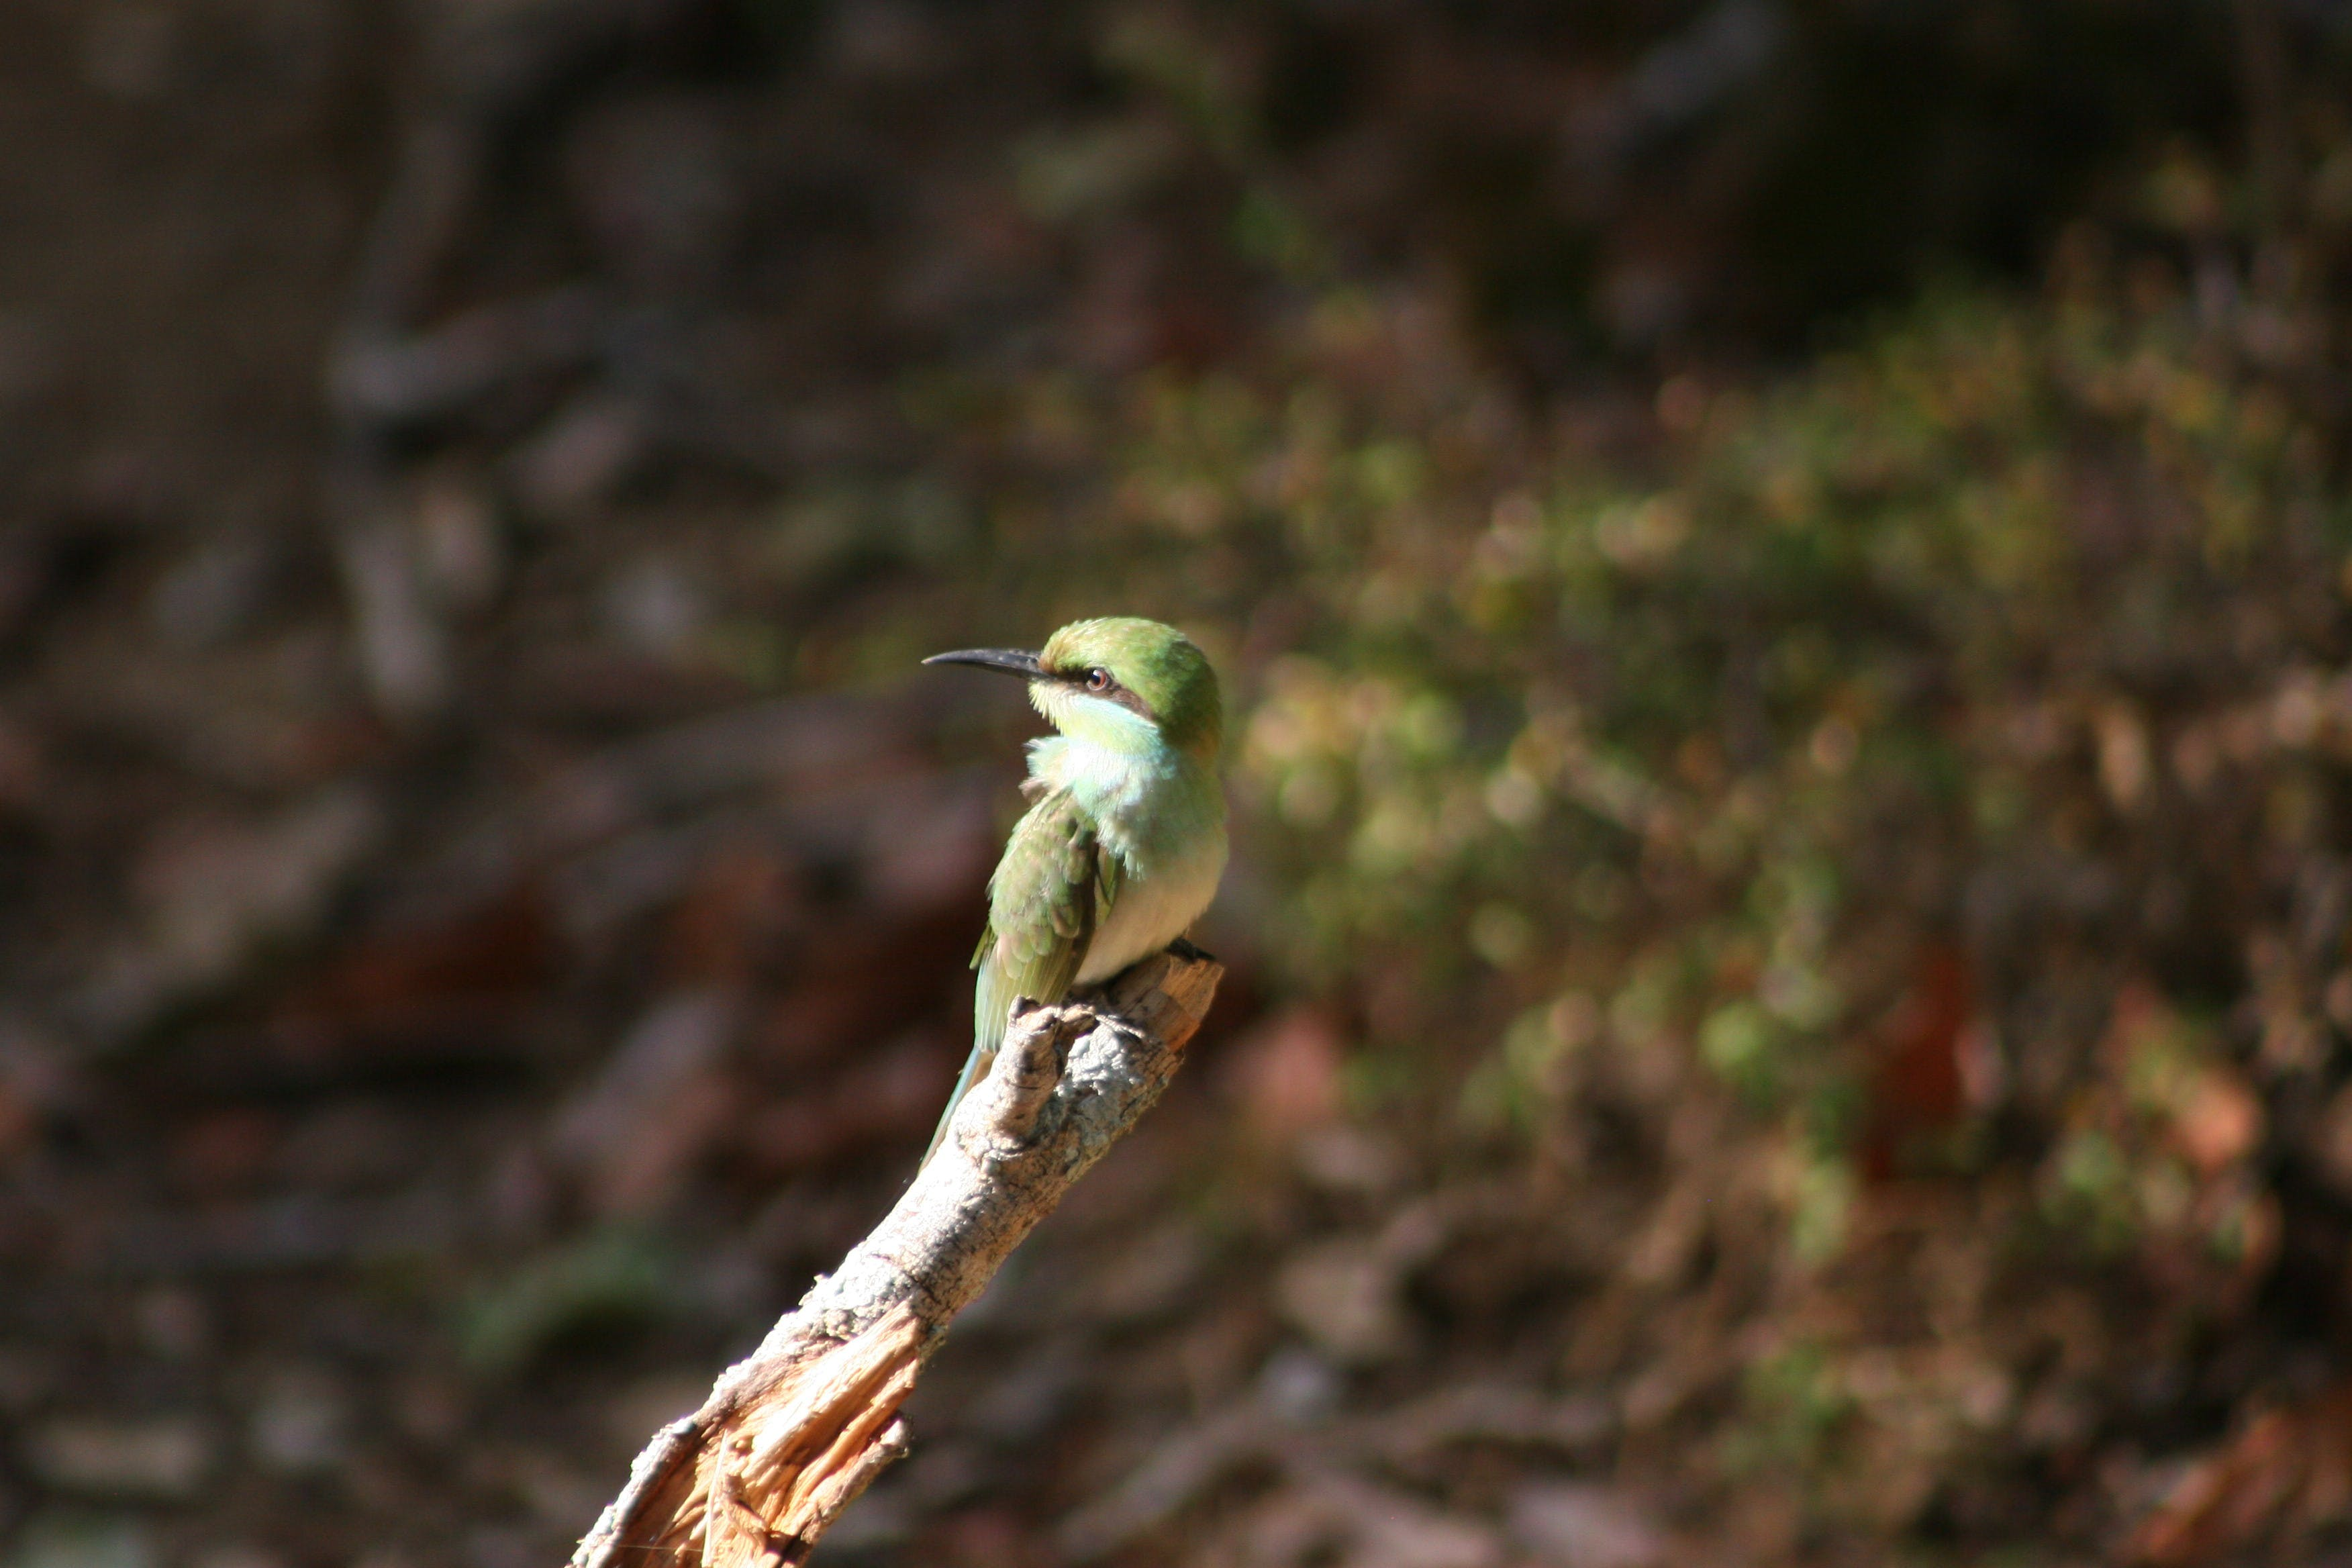 Green Long-beak Bird on Brown Wooden Tree Branch